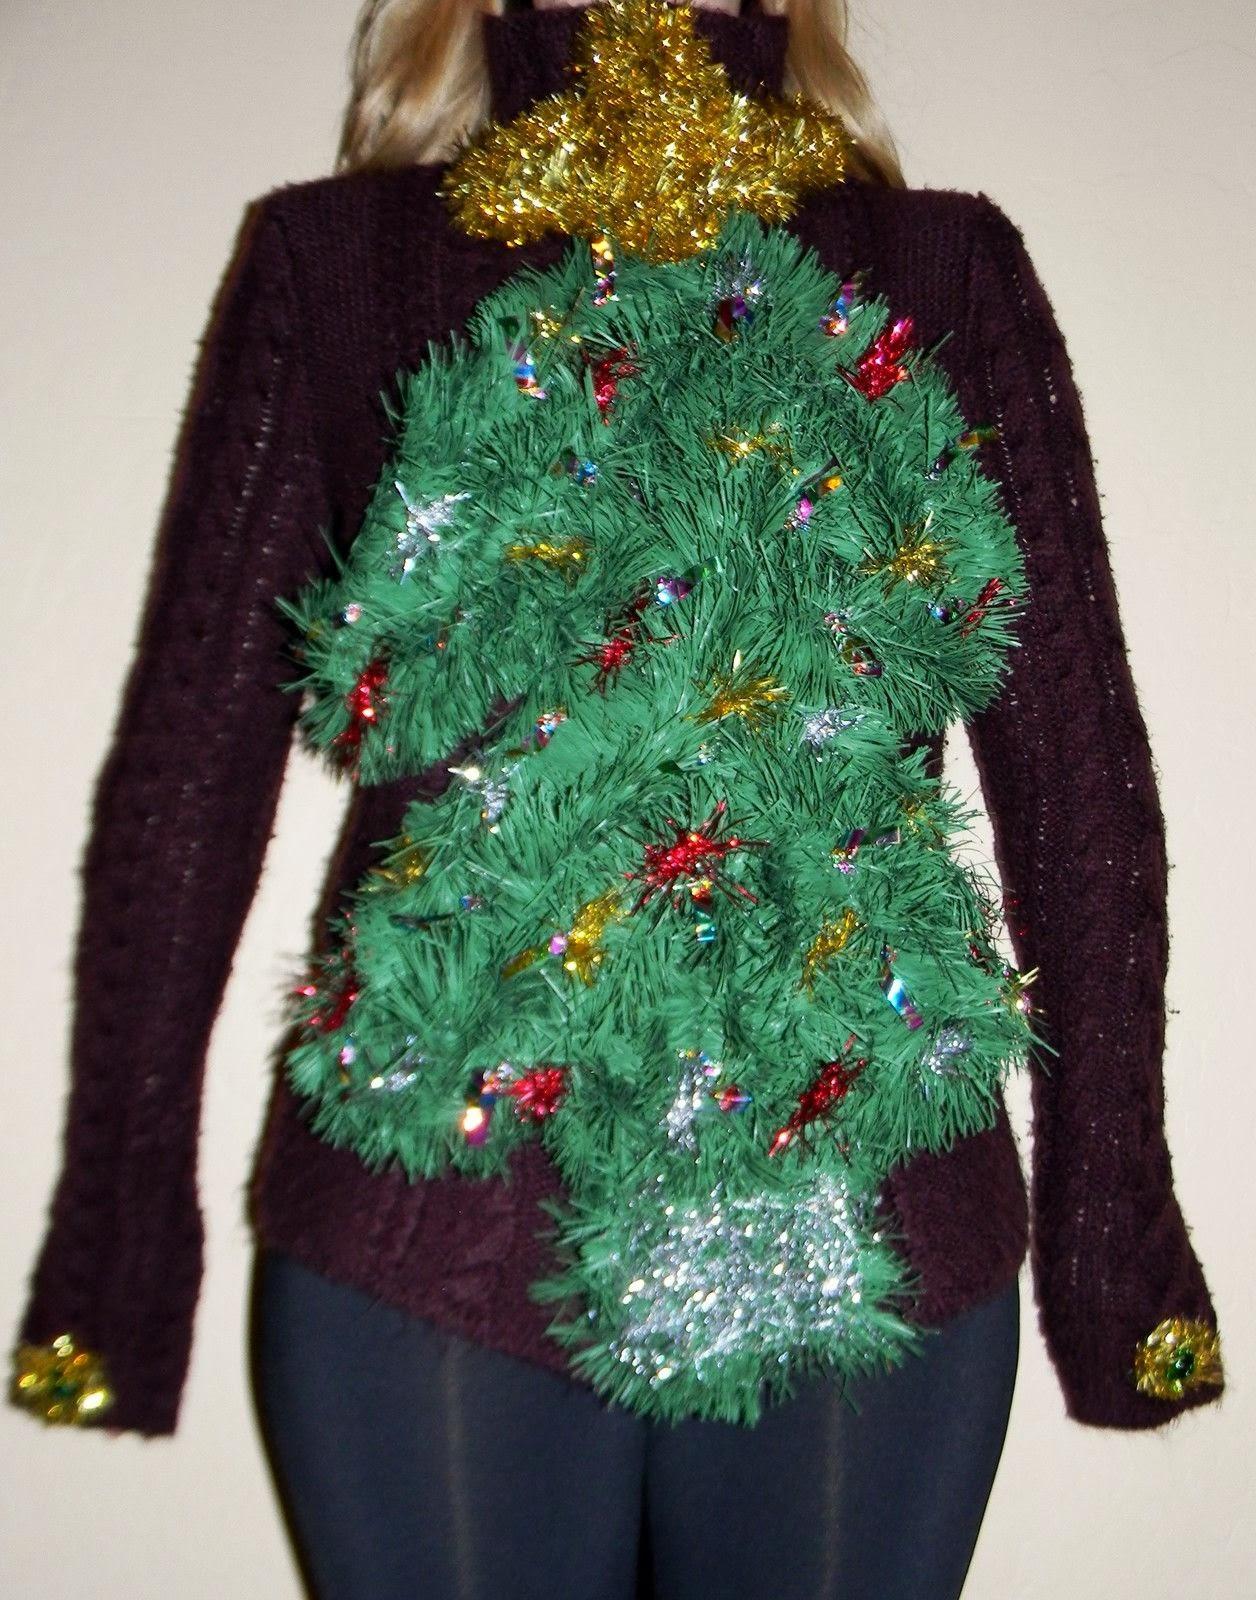 Ugly Christmas Sweater Ideas DIY  DIY Handmade Ugly Christmas Sweater Ideas Crafty Morning